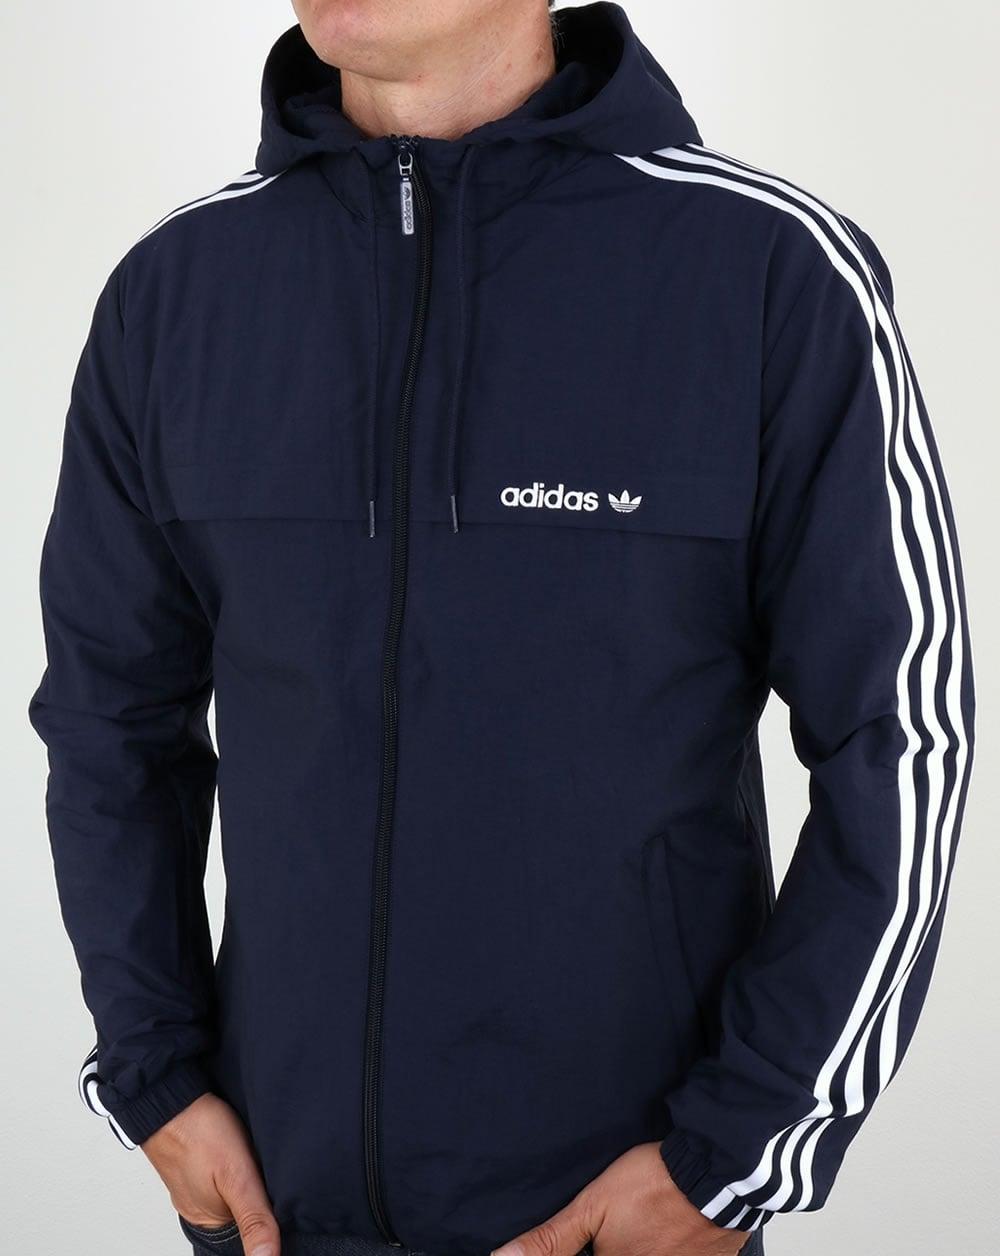 Adidas Originals 3 Striped Windbreaker Blue Jacket Rain